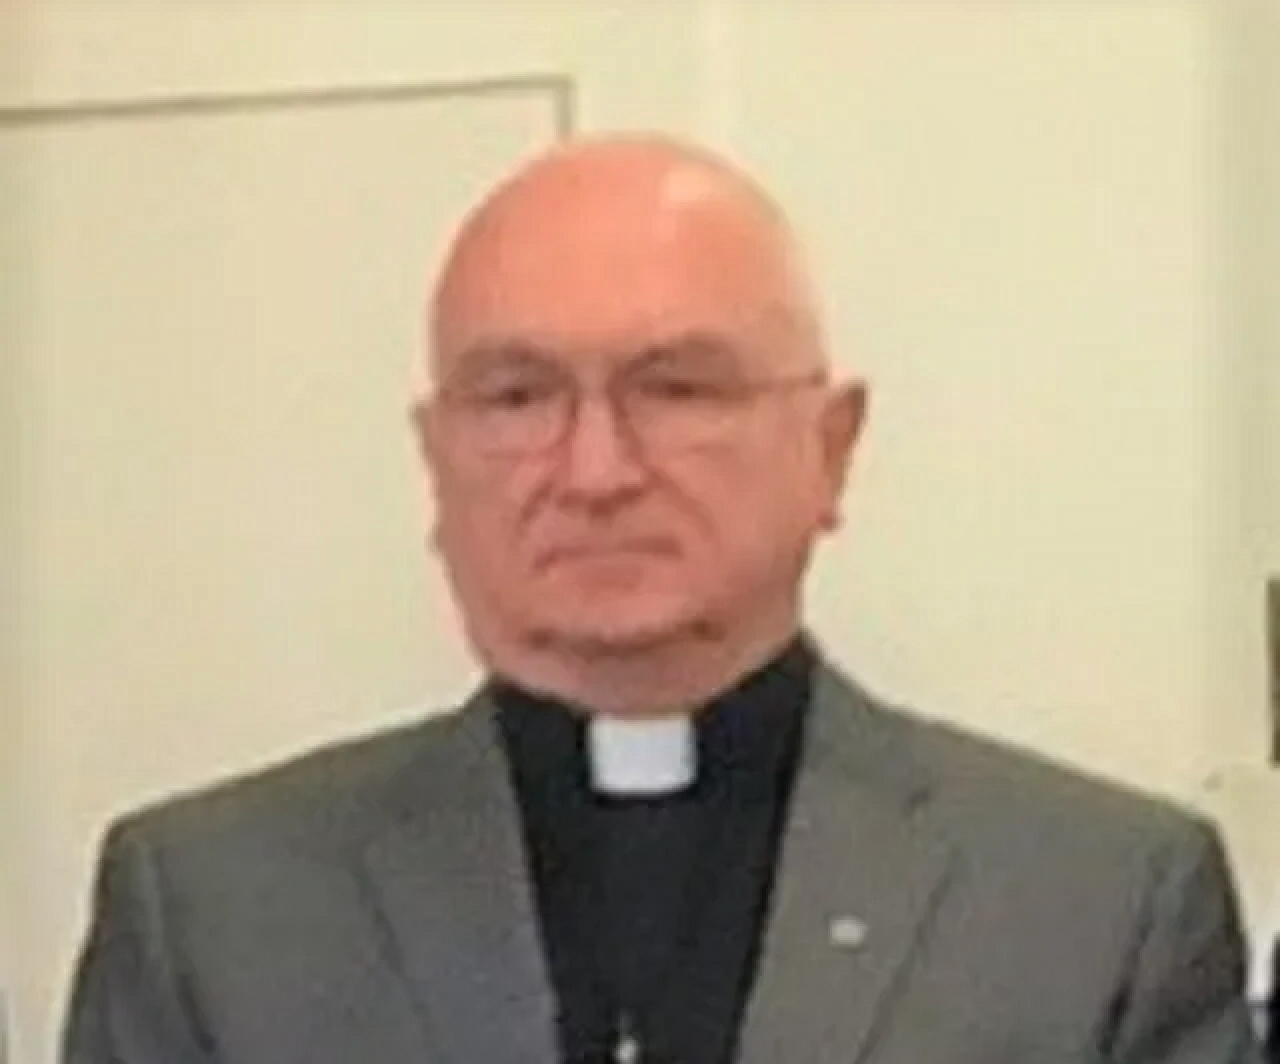 Presbyterian Pastor Performed Oral Sex On Men To Get Rid